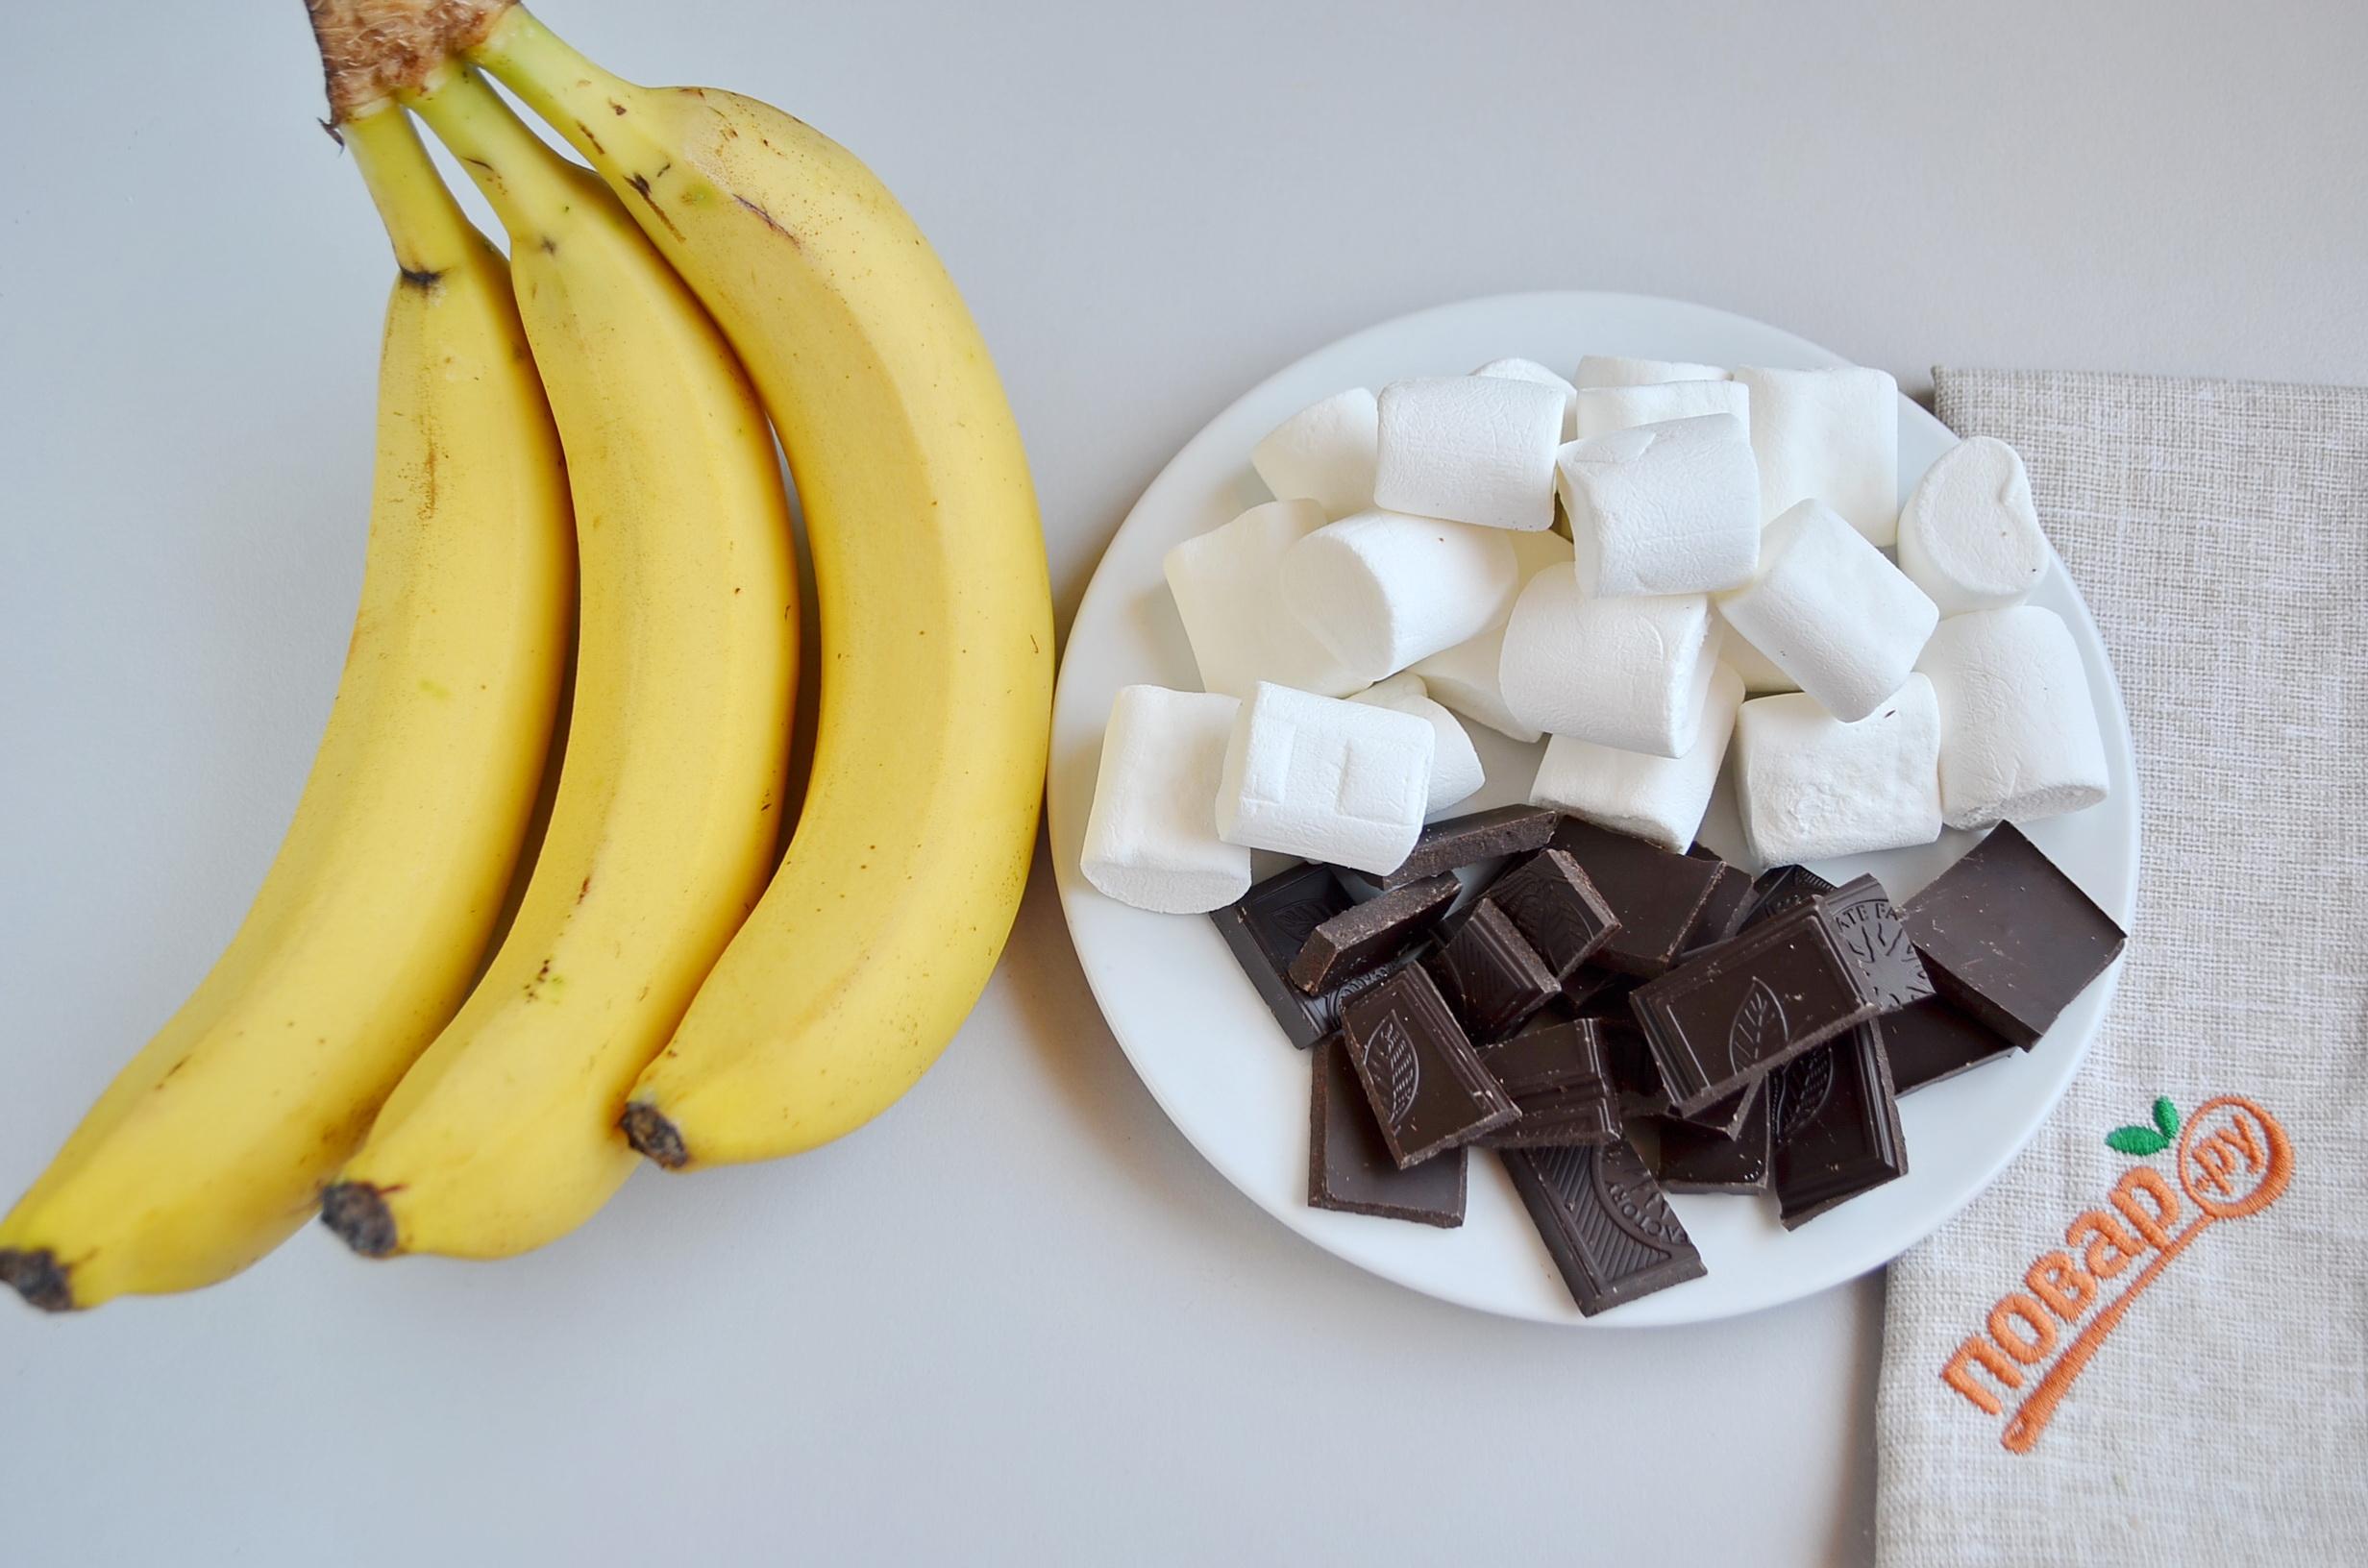 Запеченные бананы, шаг 1: приготовьте бананы, маршмэллоу, шоколад